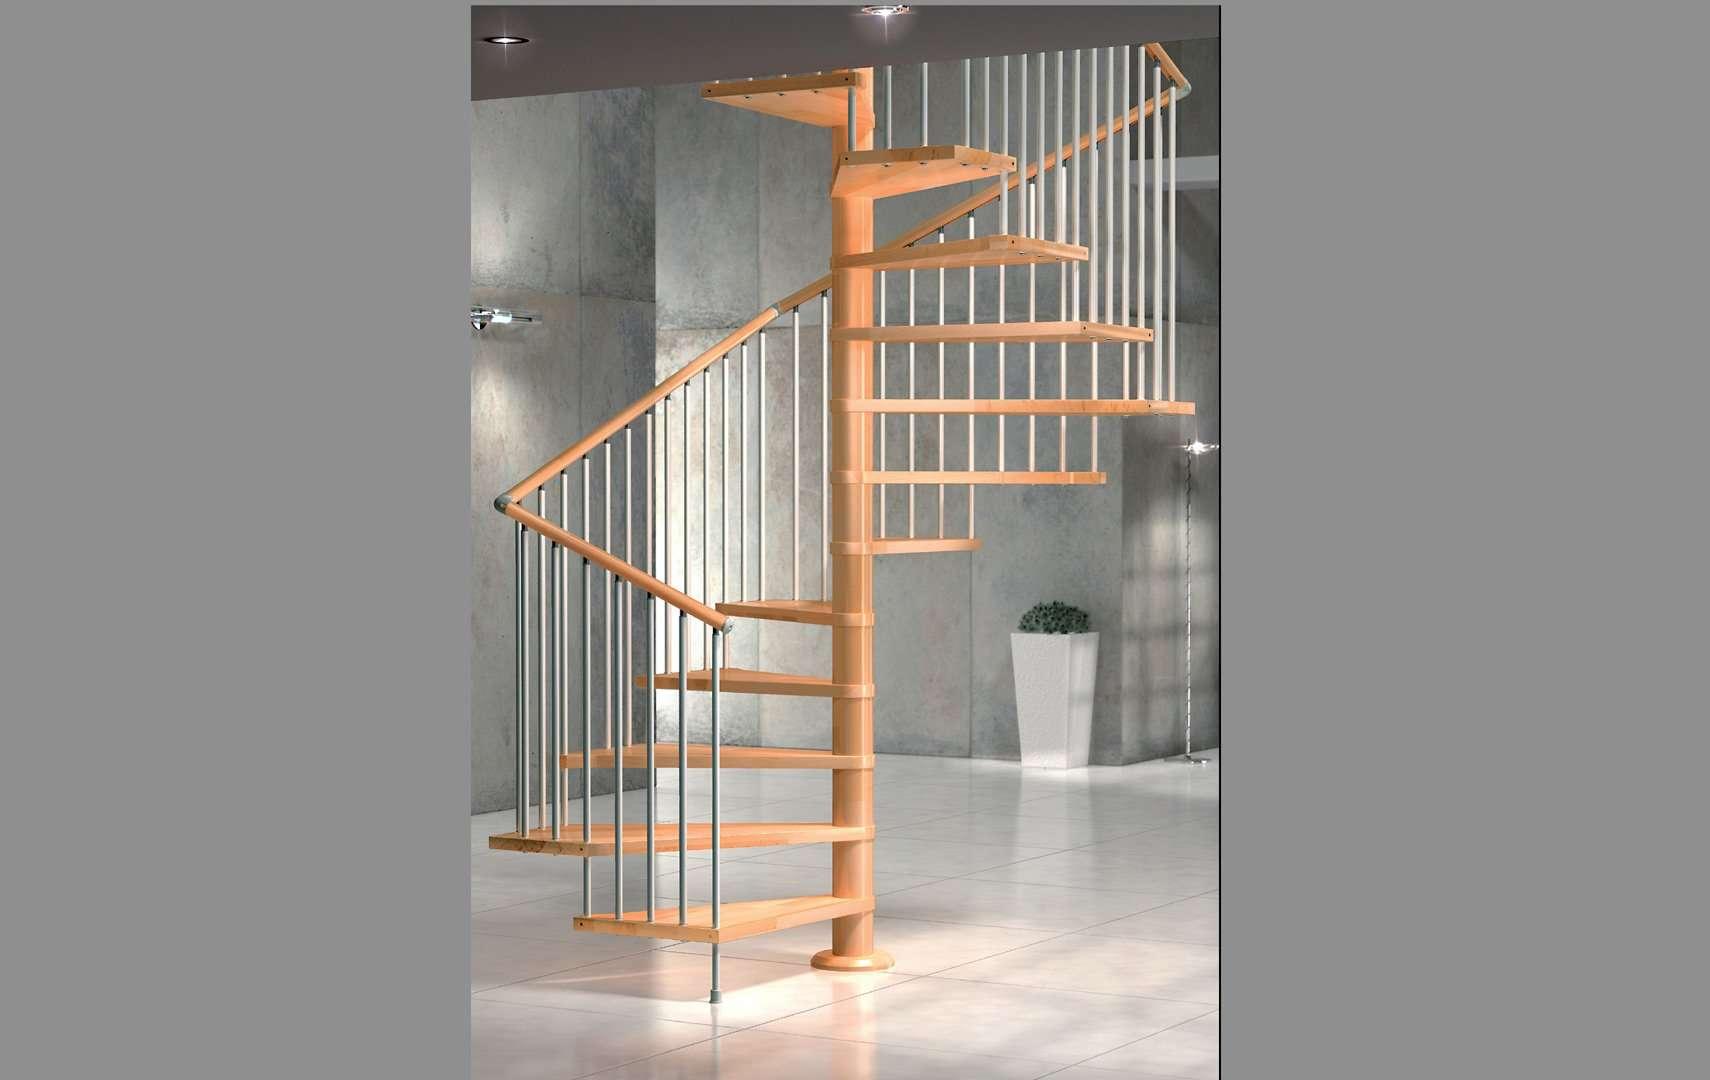 Vip escaleras italianas escaleras de madera maciza for Escaleras de metal para exteriores